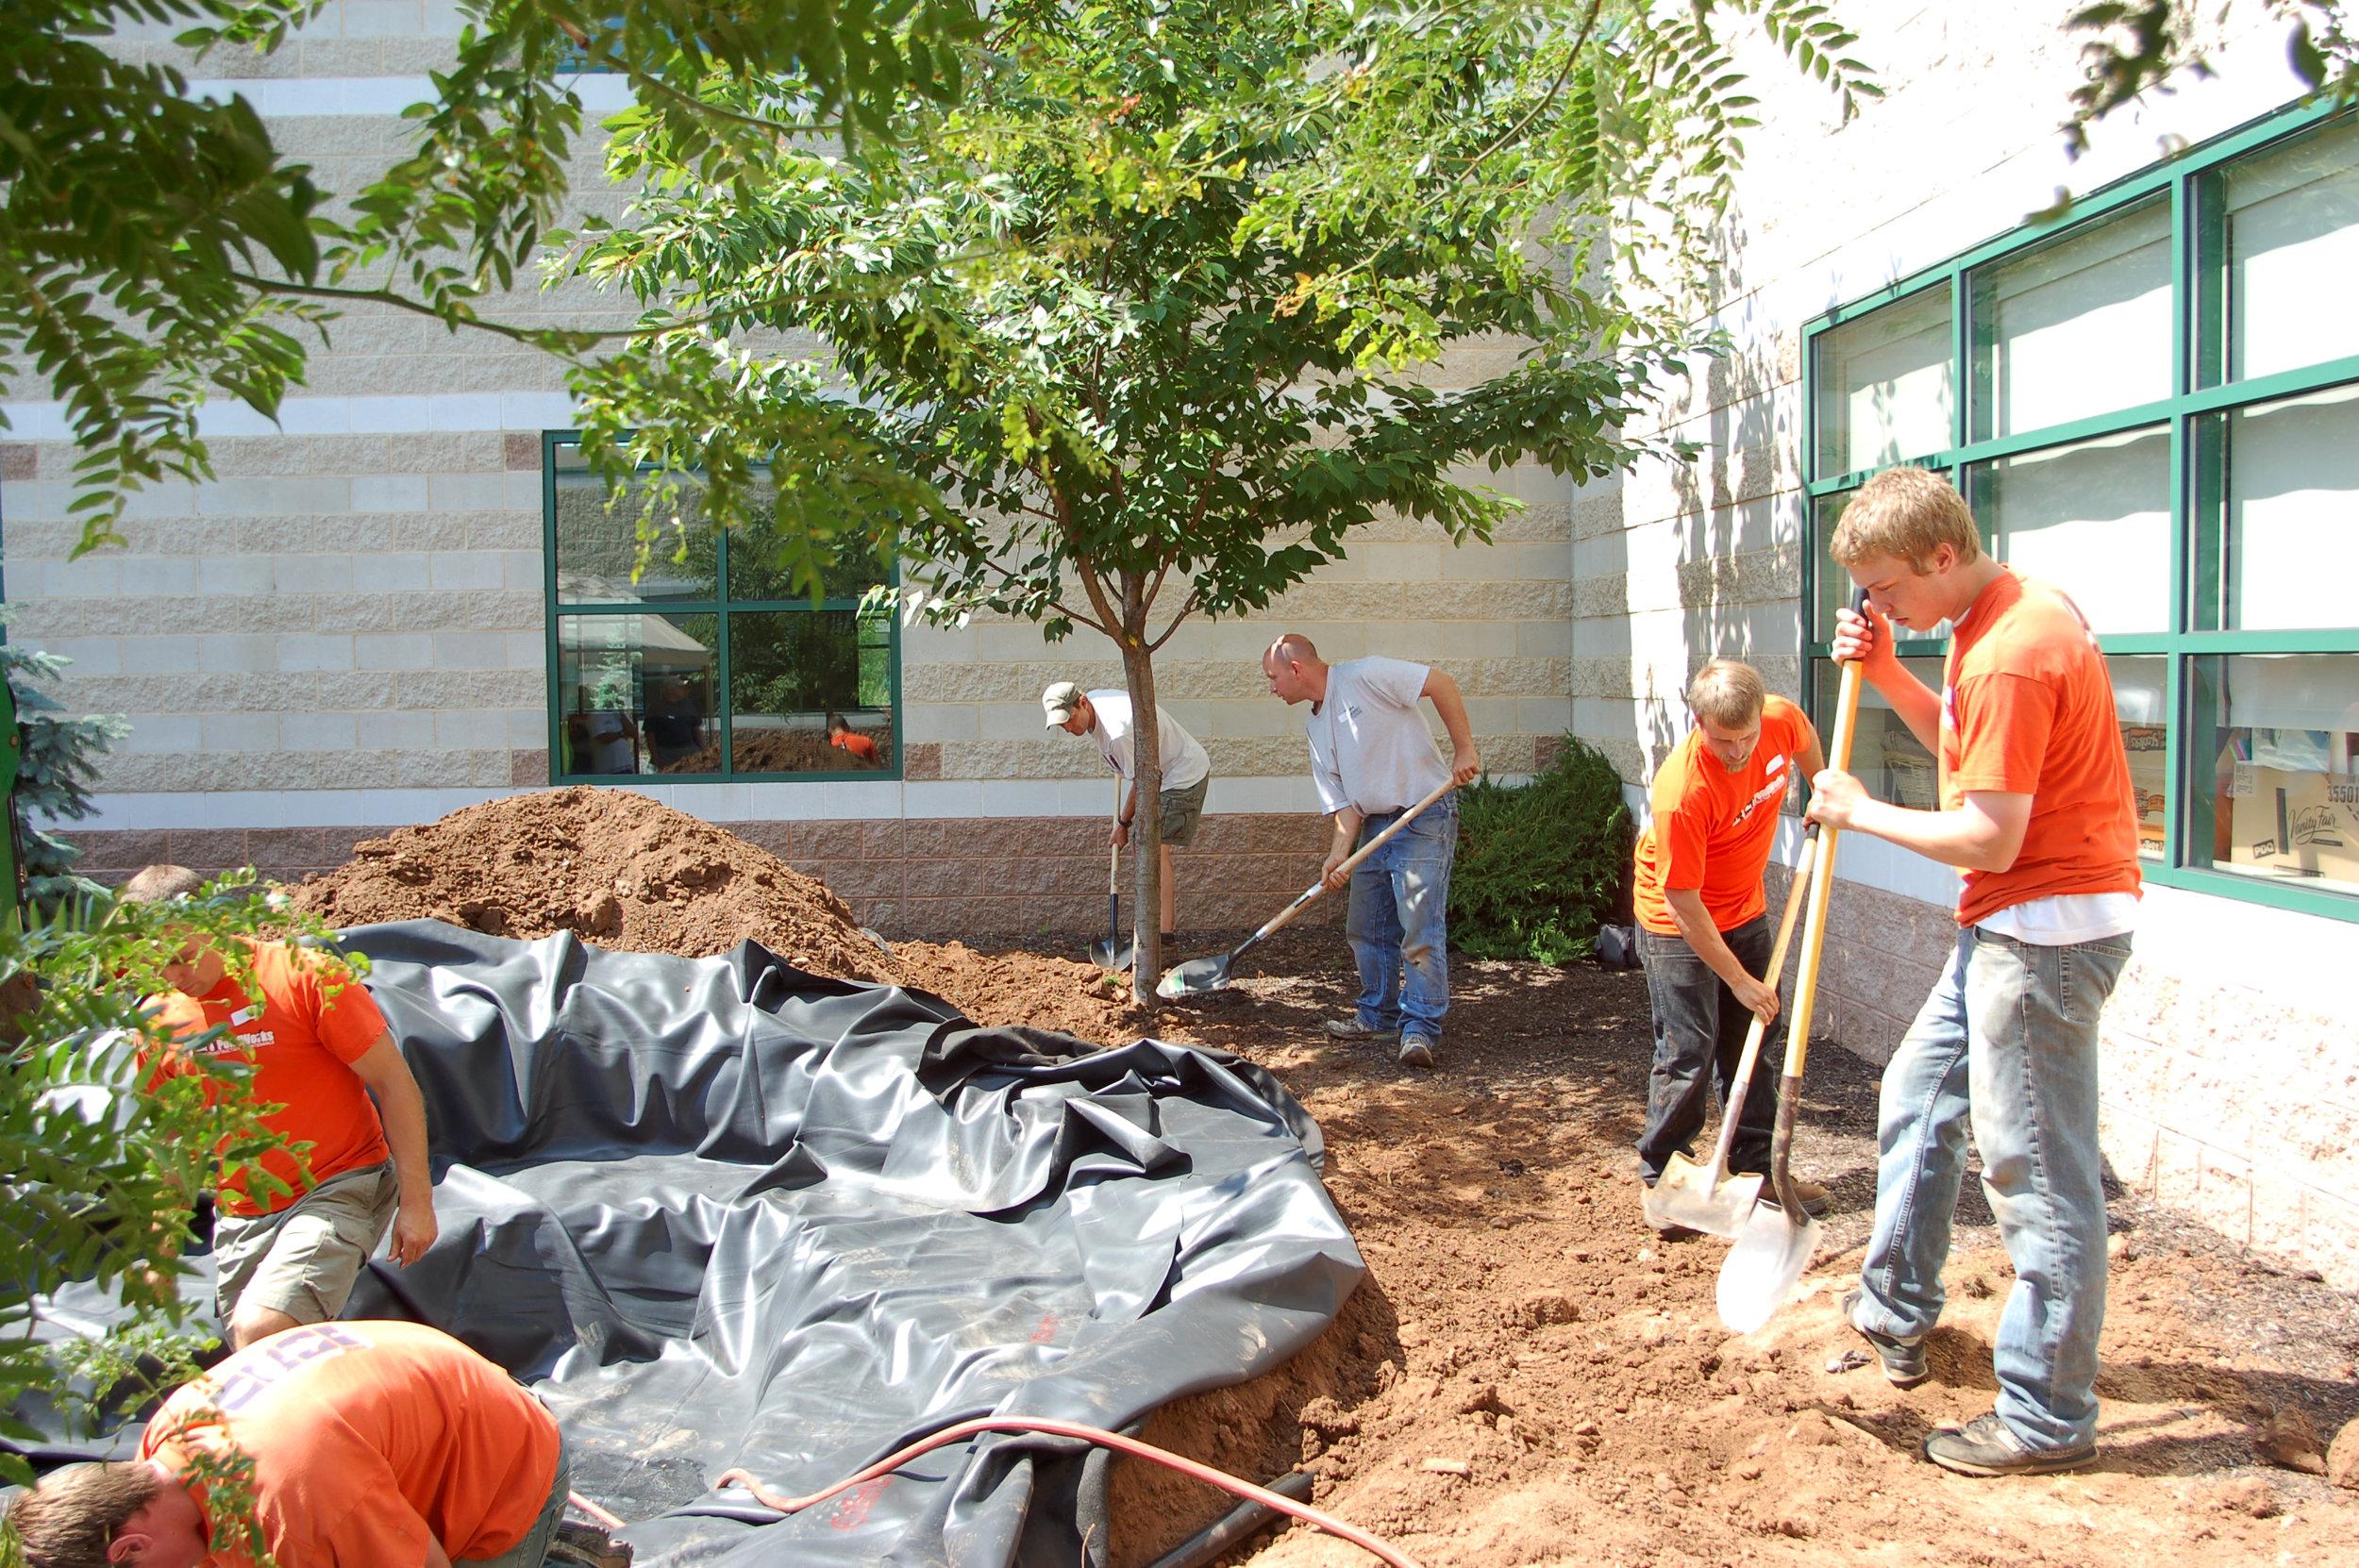 Pondworks_community_Design build_project_custom_Pond_PennView Christian School_02.JPG